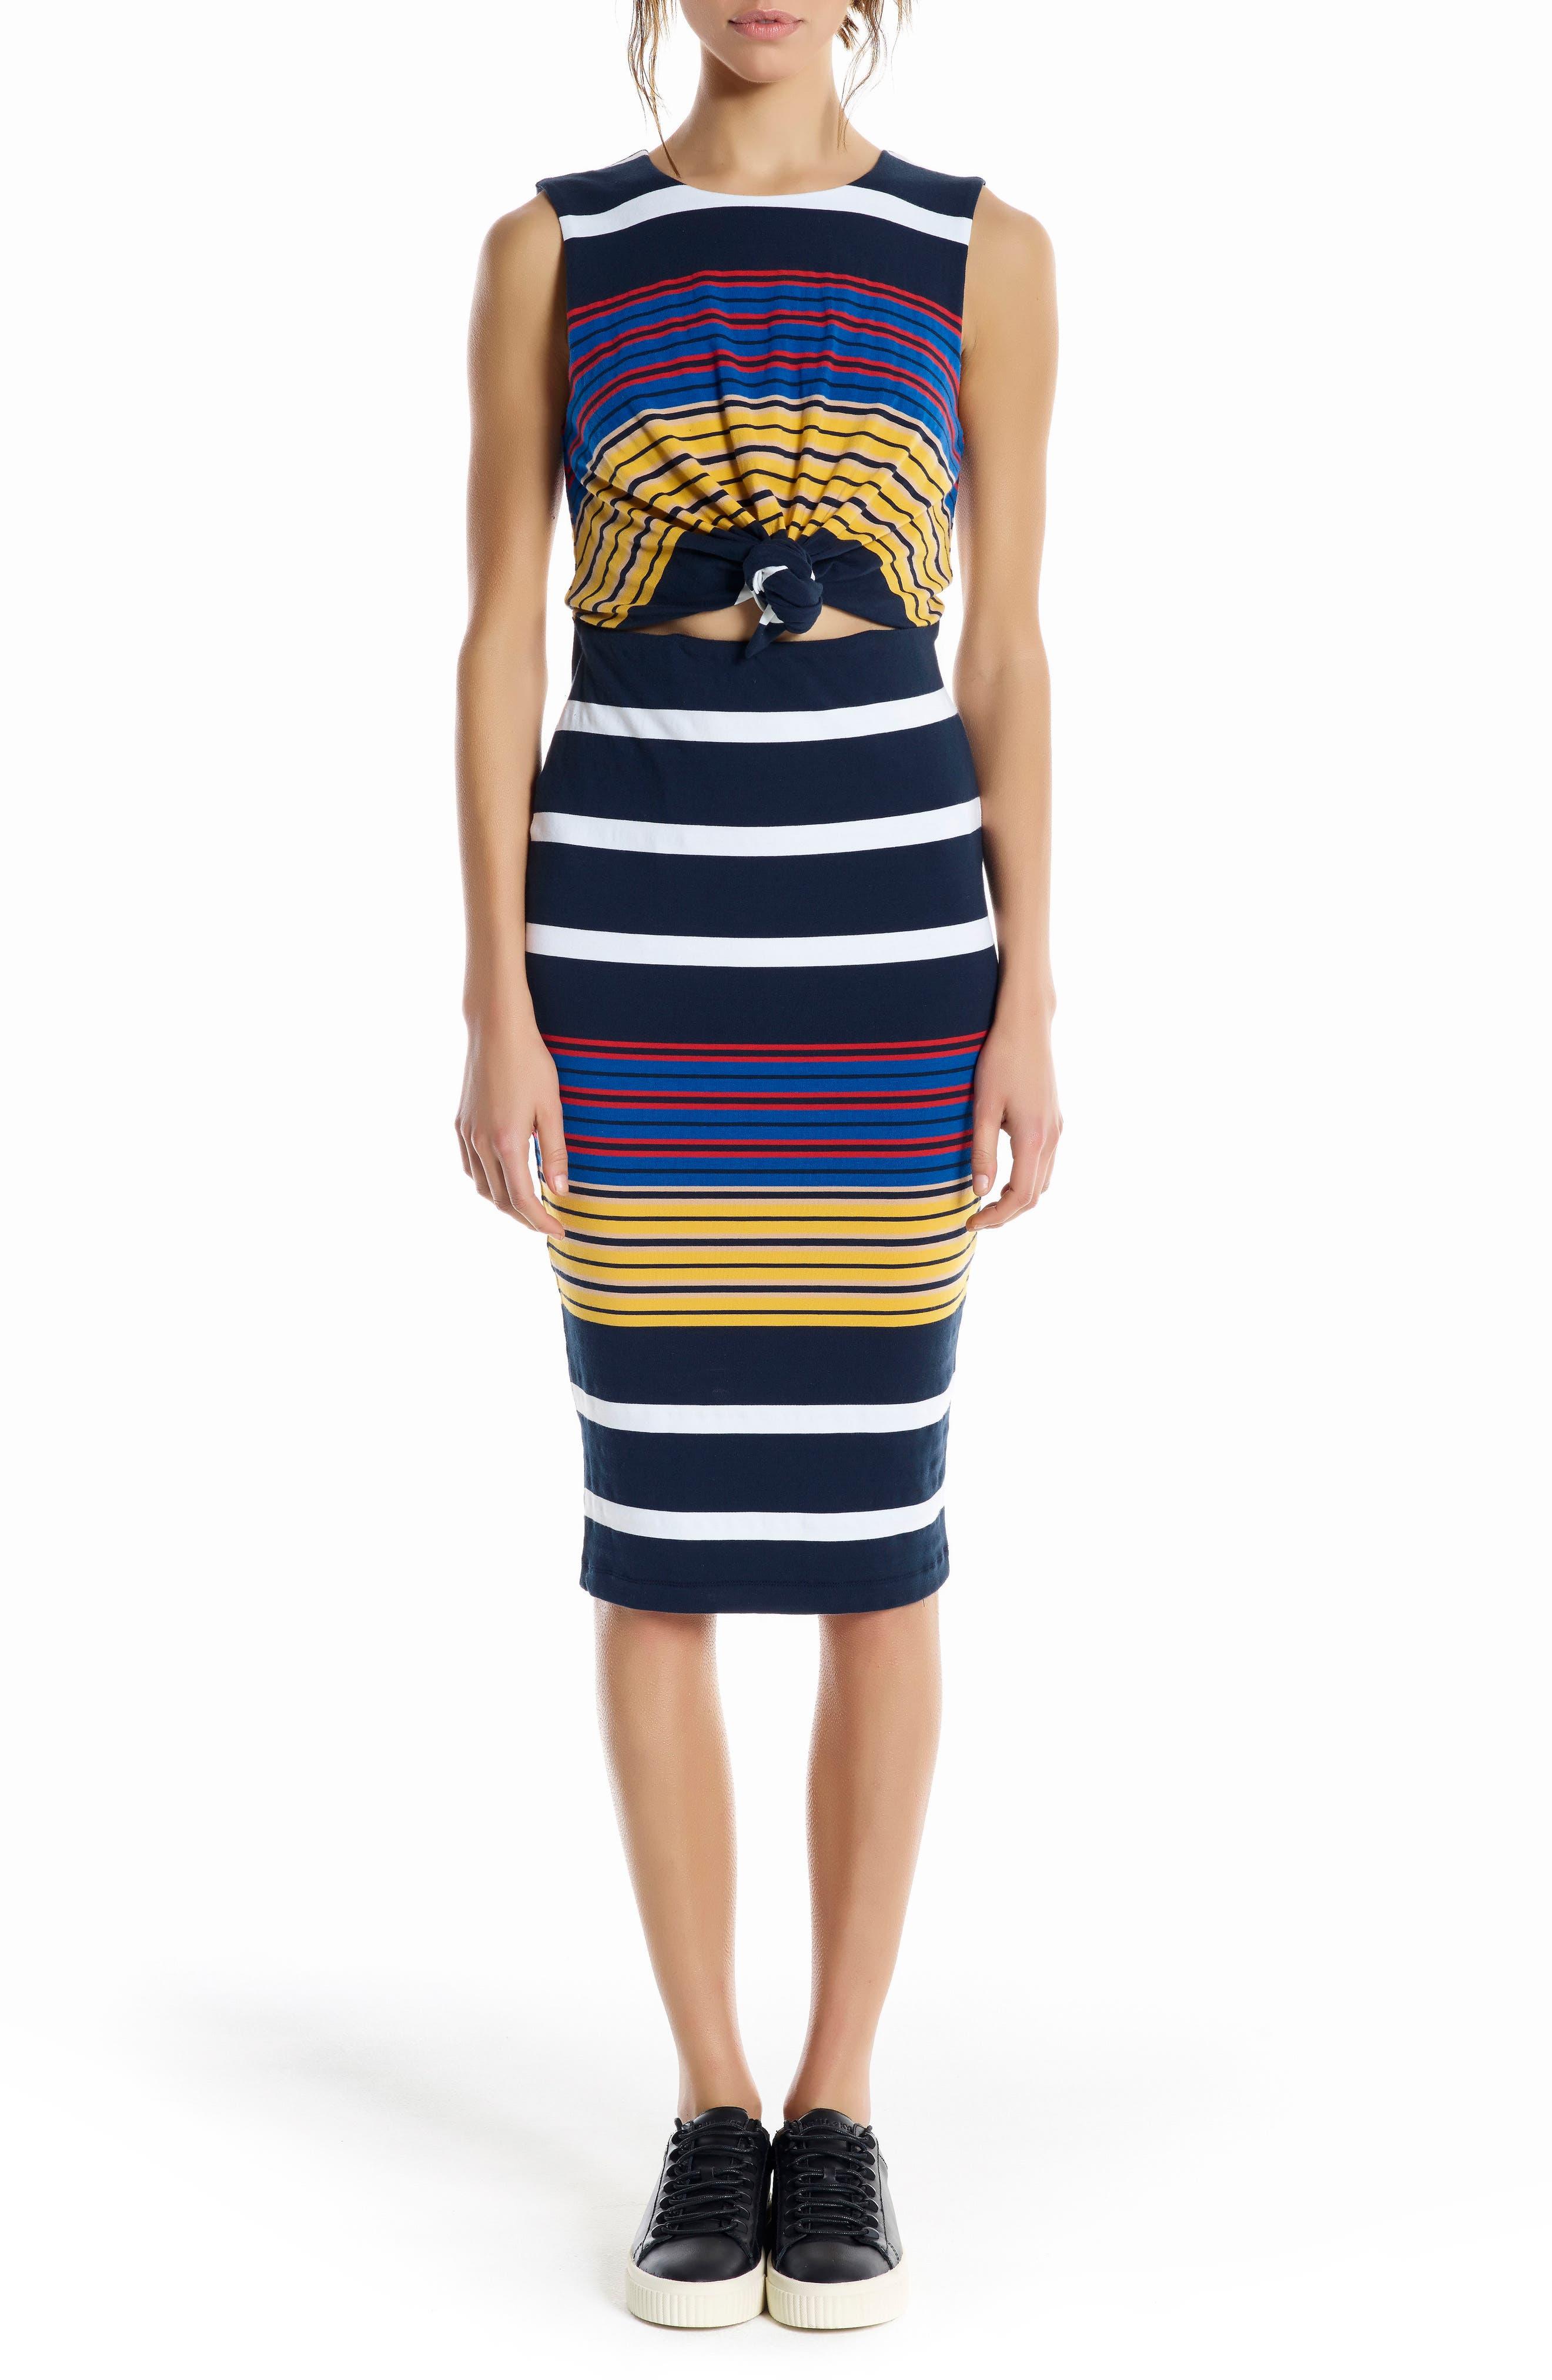 KENDELL + KYLIE Stripe Midi Dress,                         Main,                         color, 001